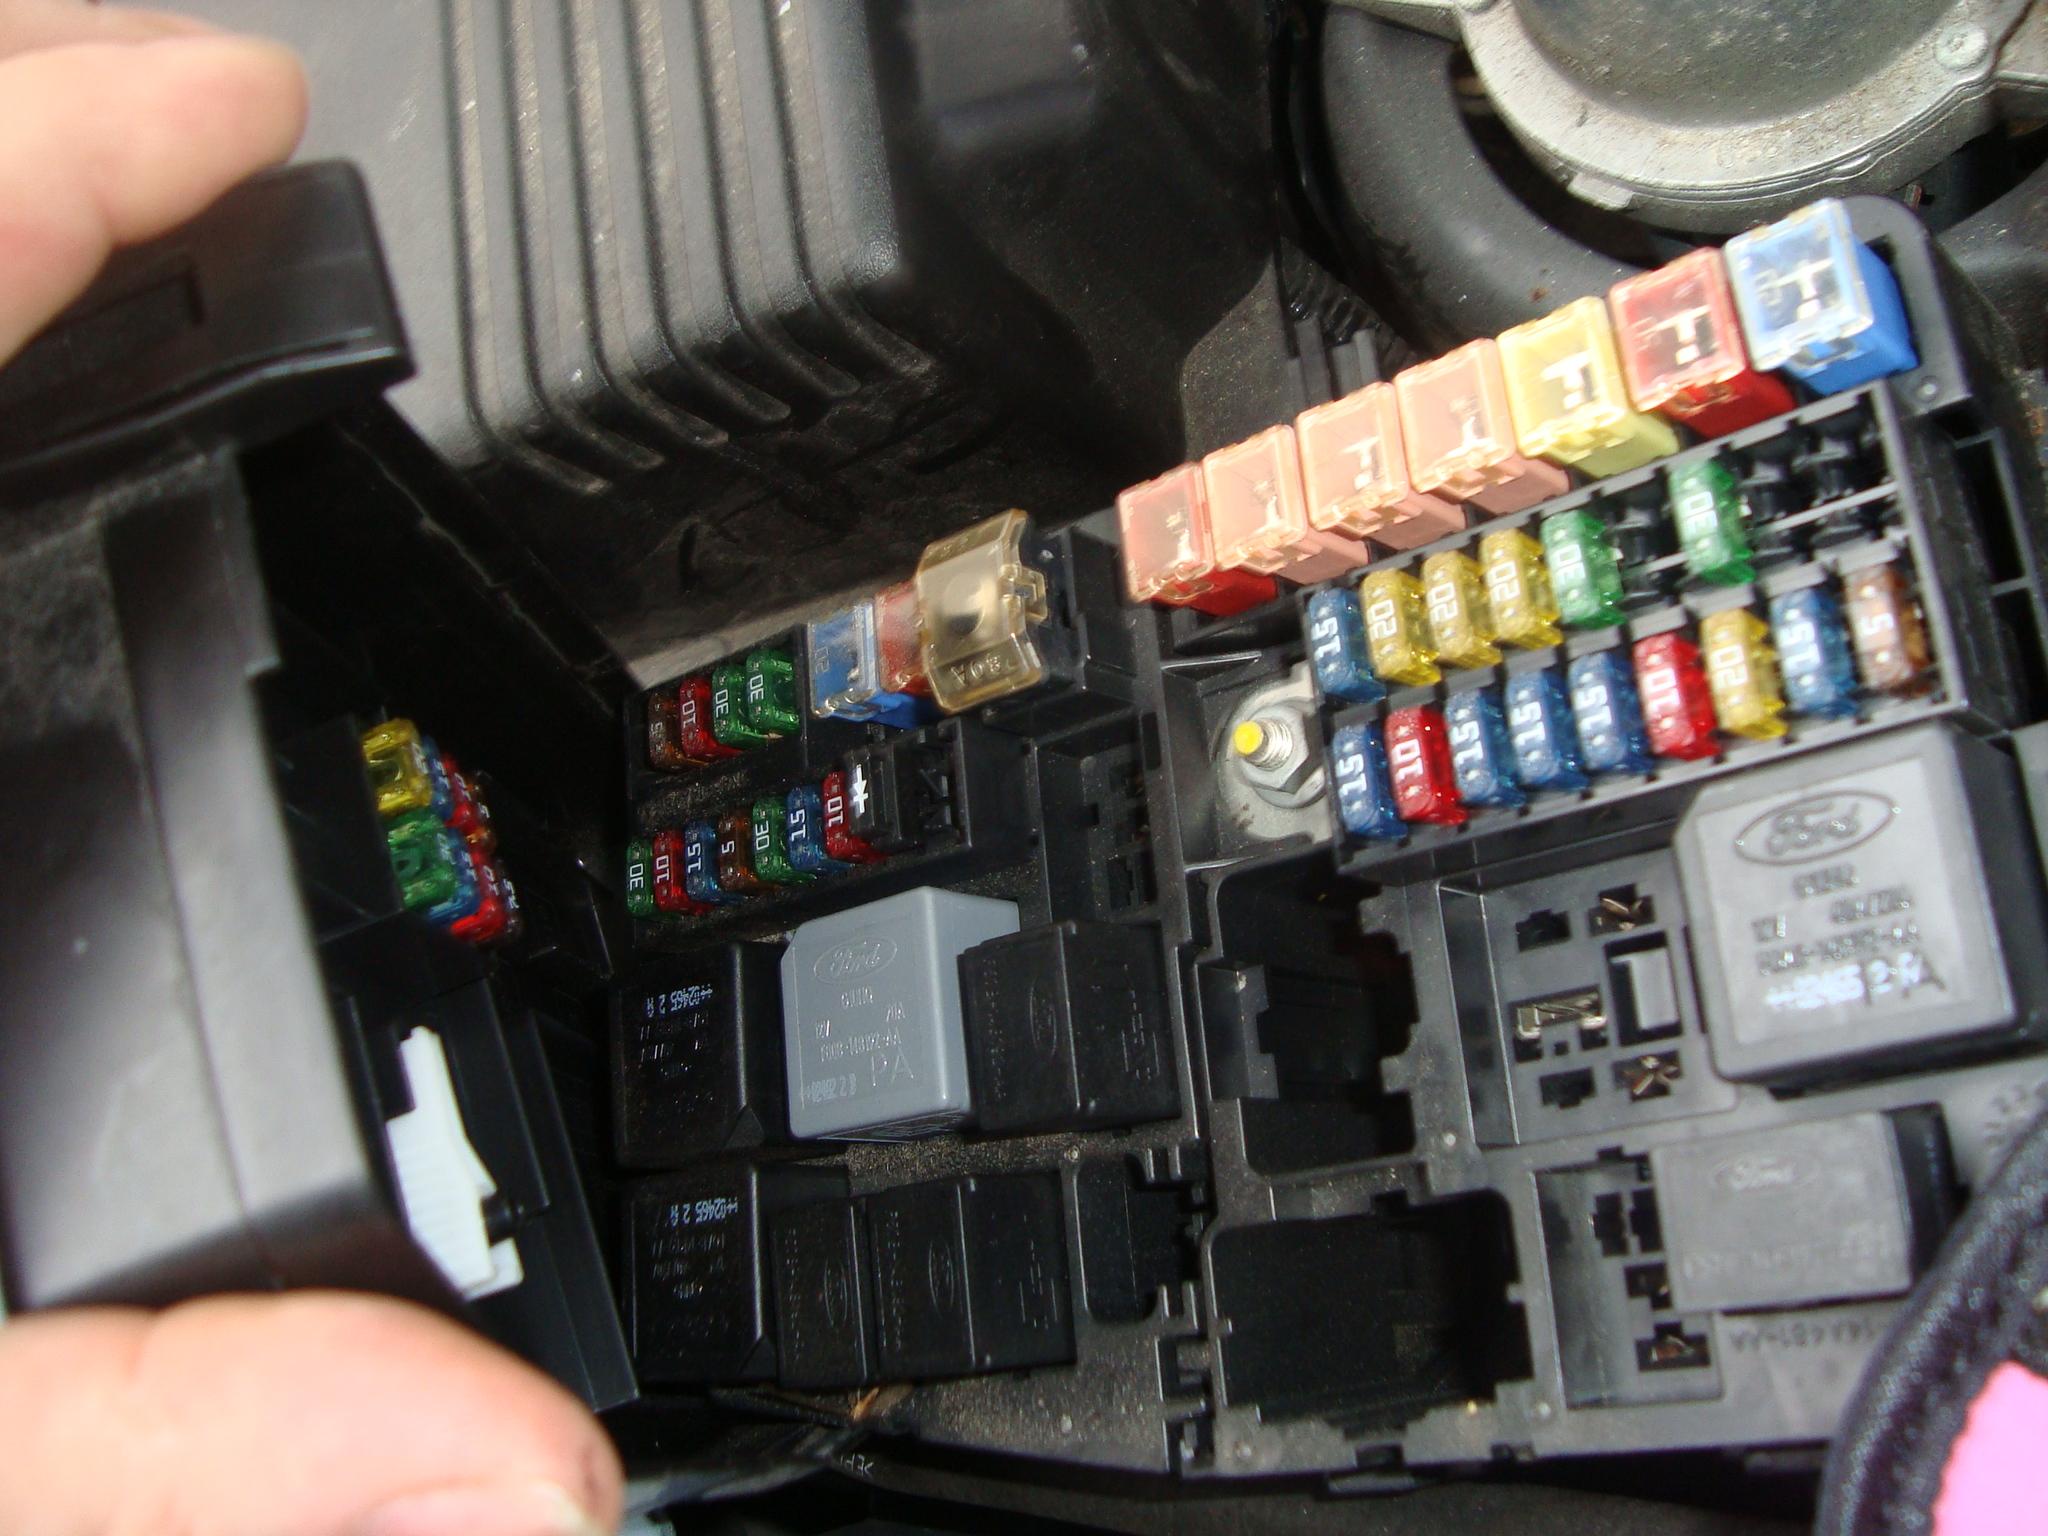 2001 Jaguar Xj8 Engine Compartment Fuse Box Diagram